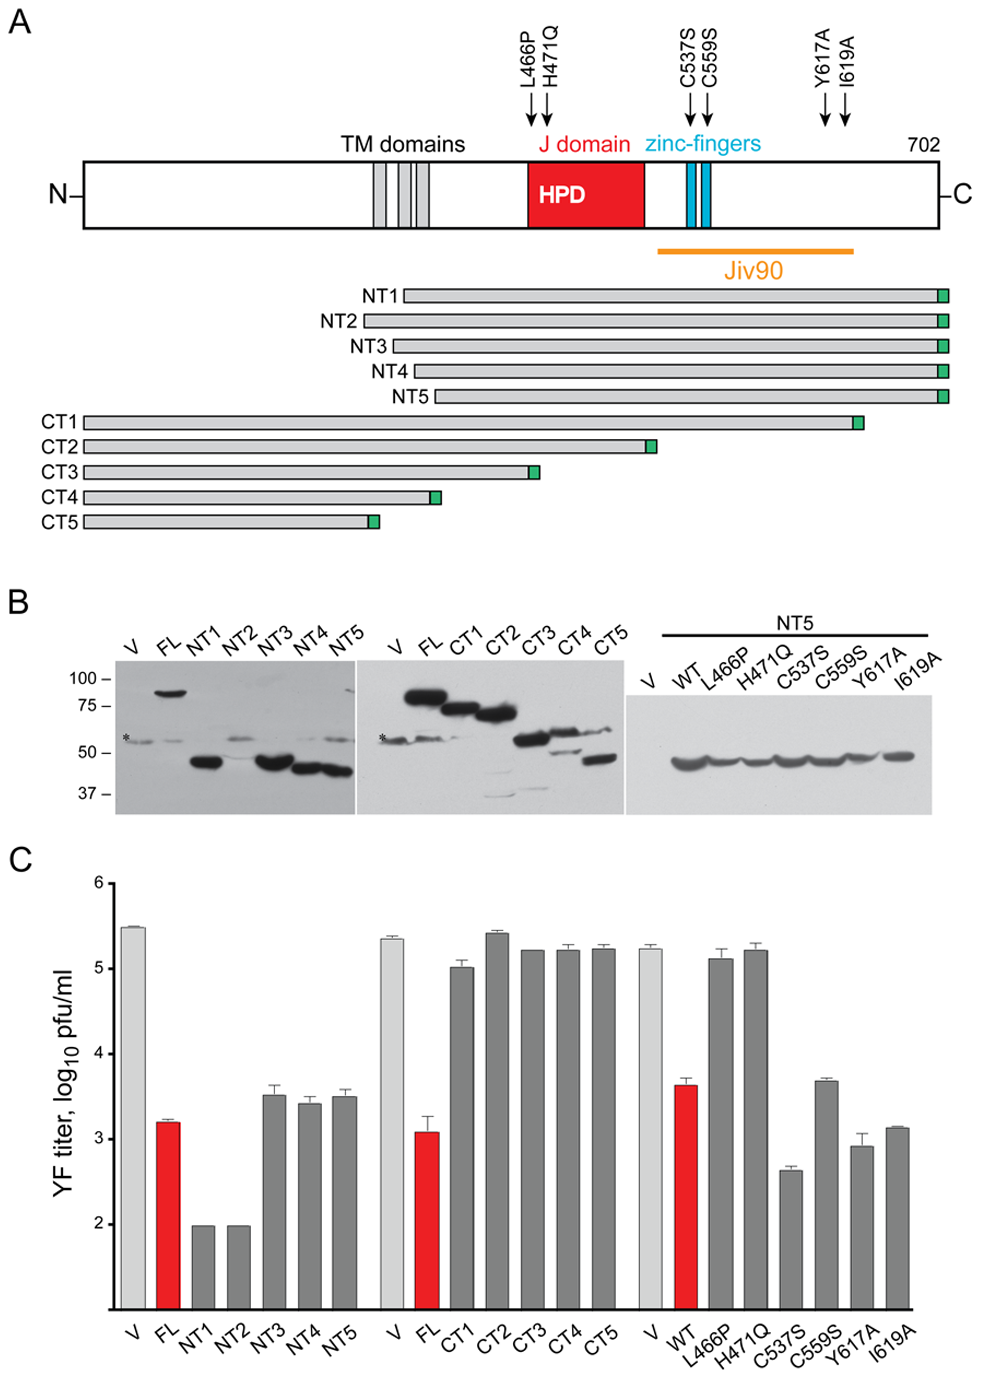 Mutagenesis of DNAJC14.